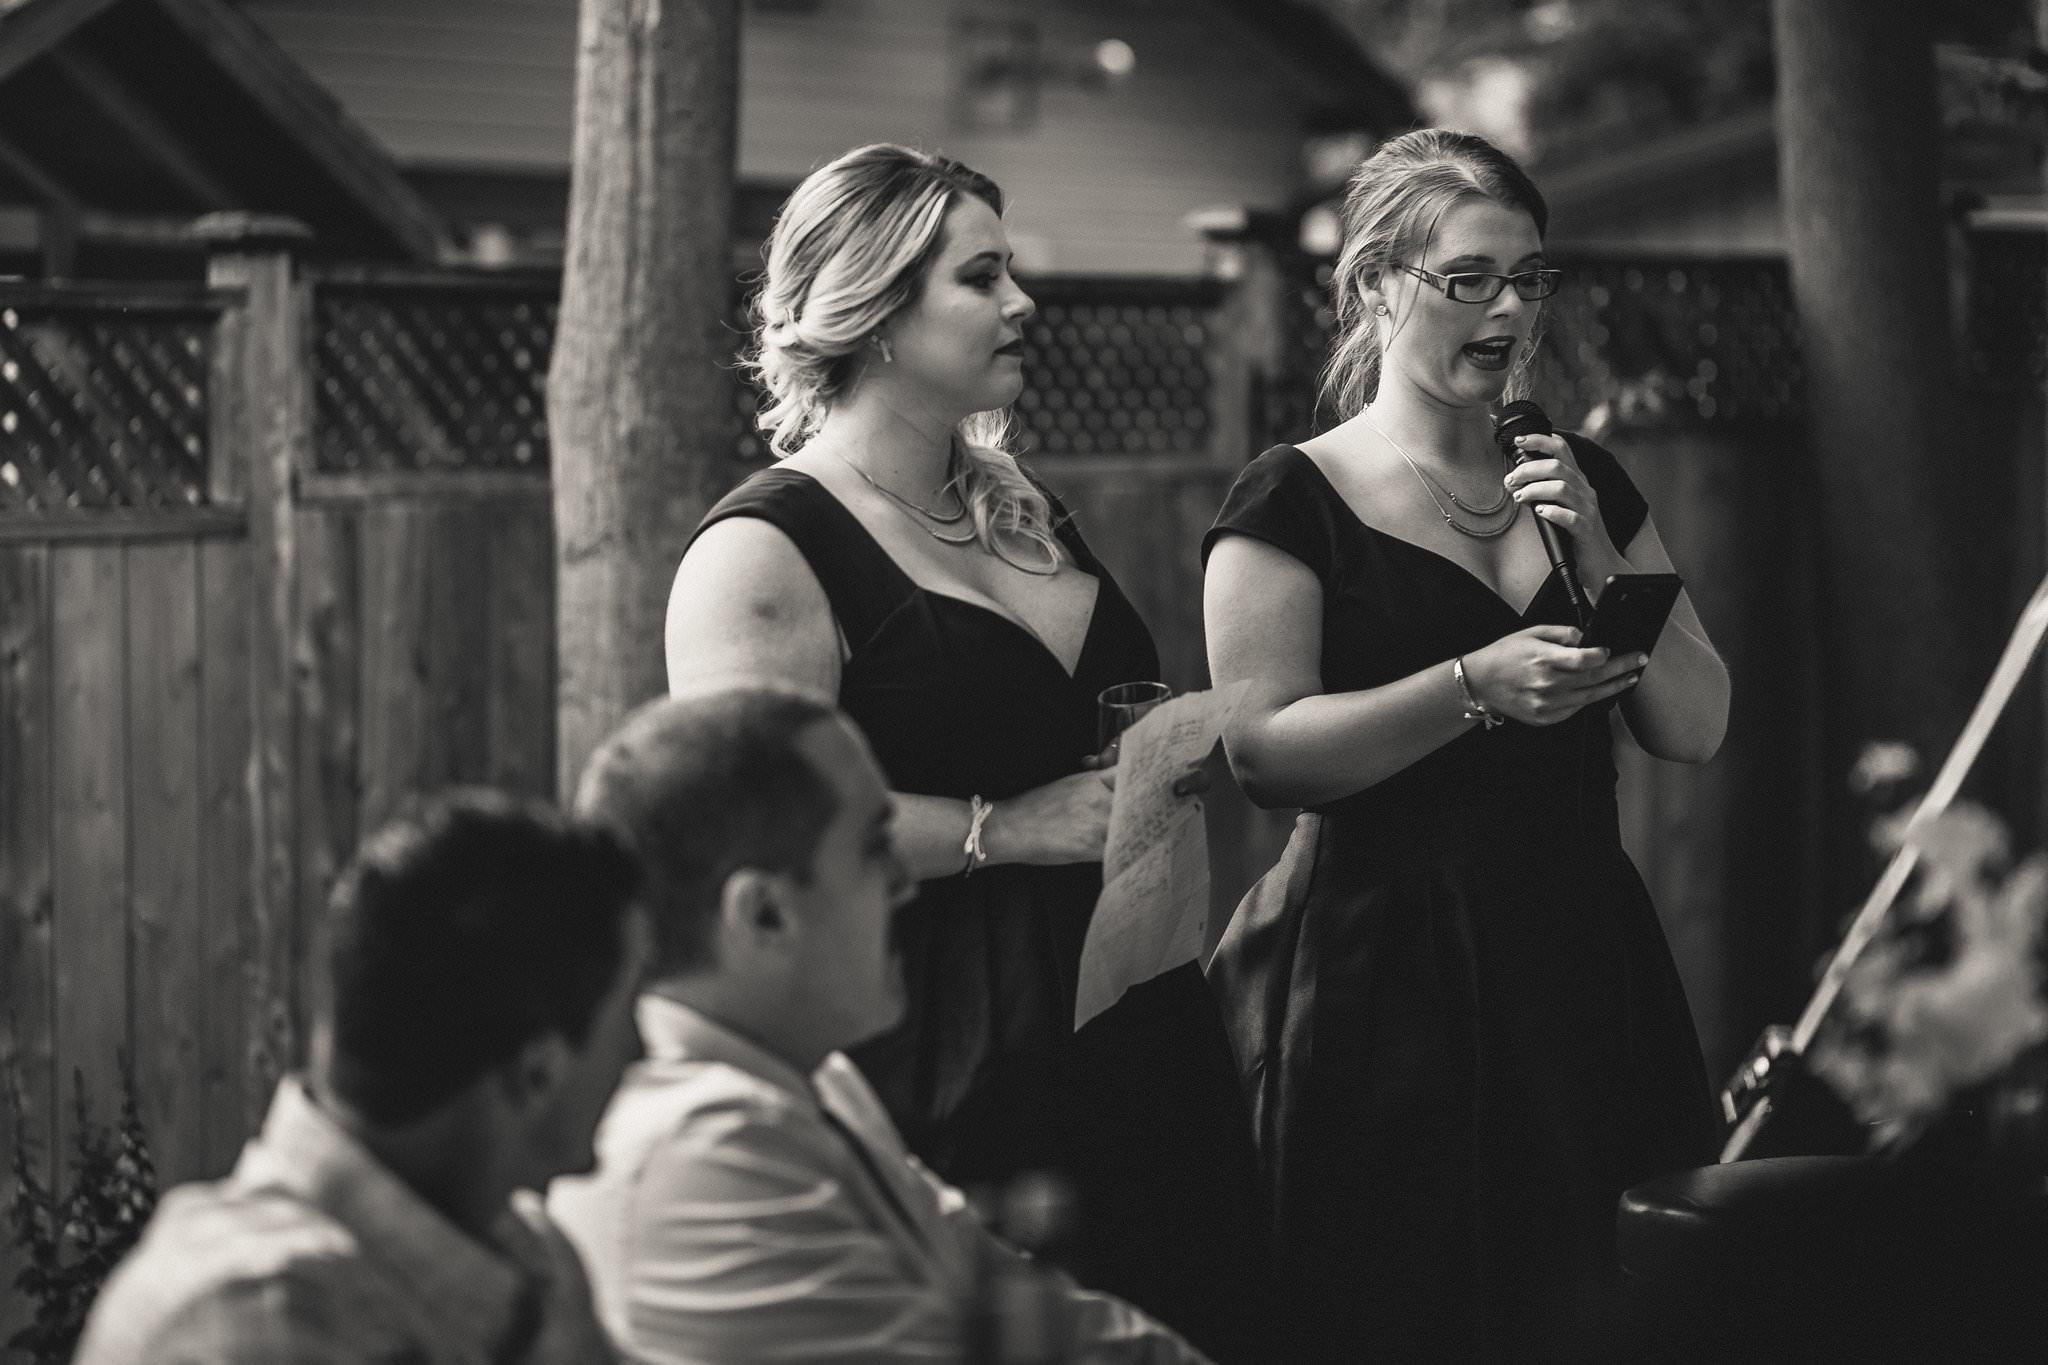 Kristen Adam Kindred Loft Whitby Wedding Photos 503 - Durham Wedding Photographer: Kindred Loft Wedding Photos